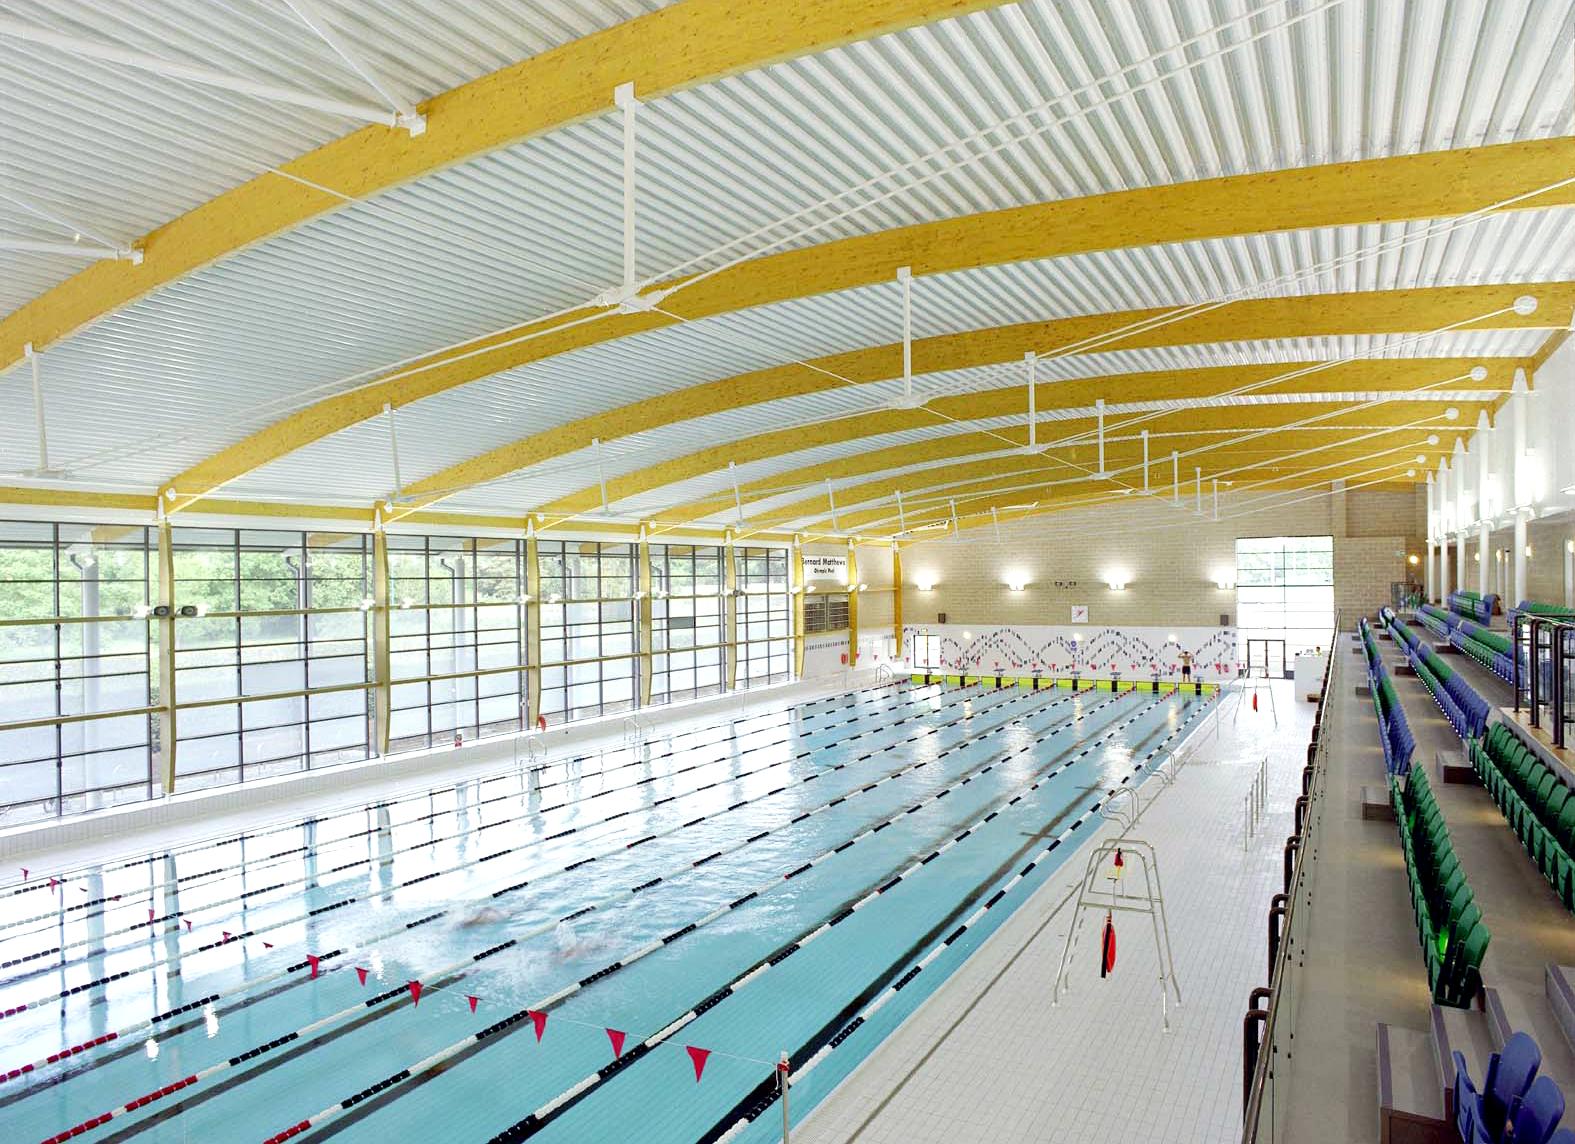 Sportspark UEA Awarded Best Sports Venue